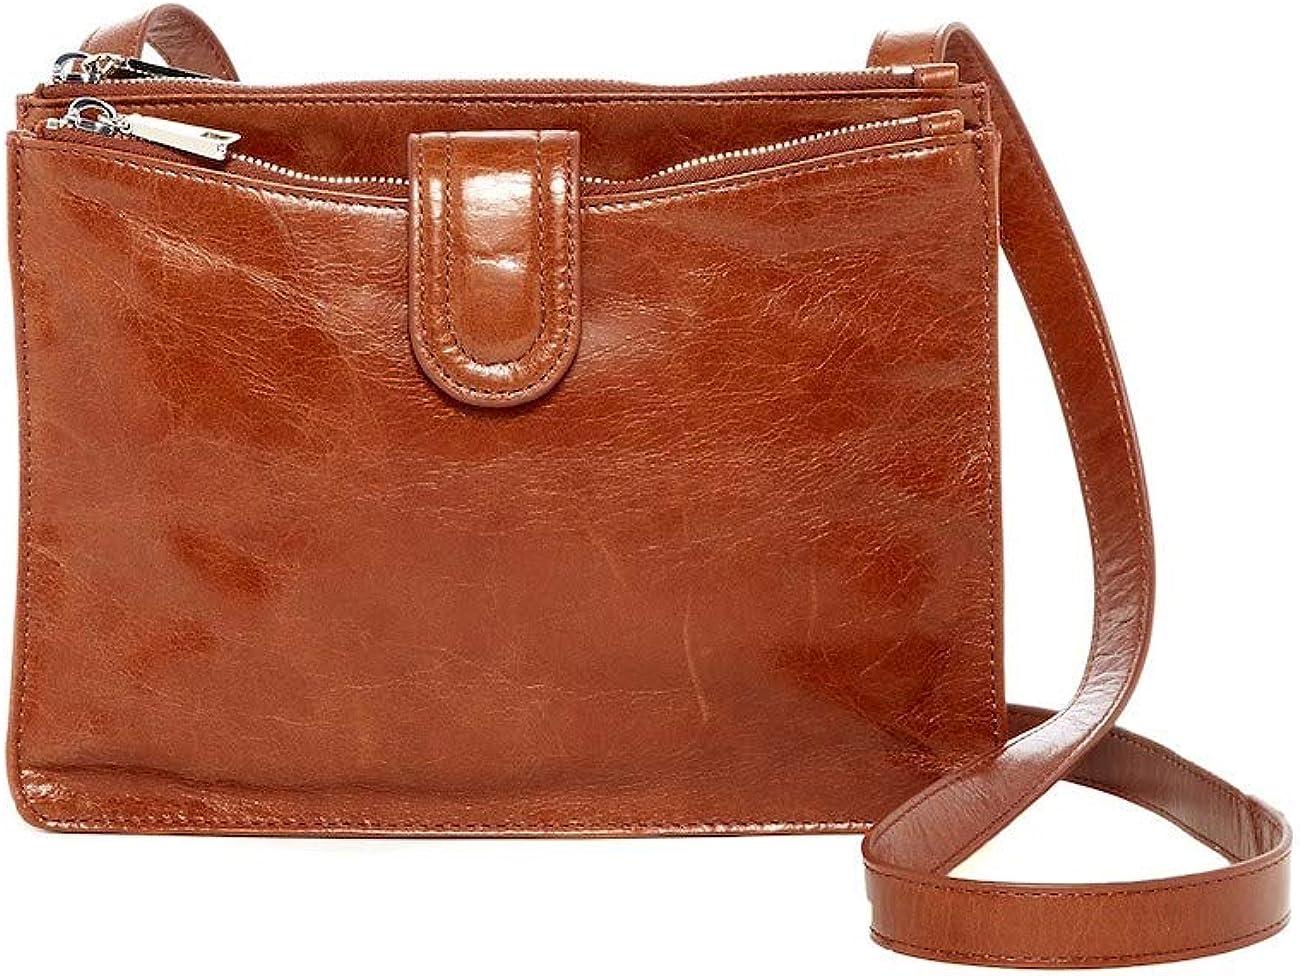 HOBO Vintage Goldie Cross-Body Handbag